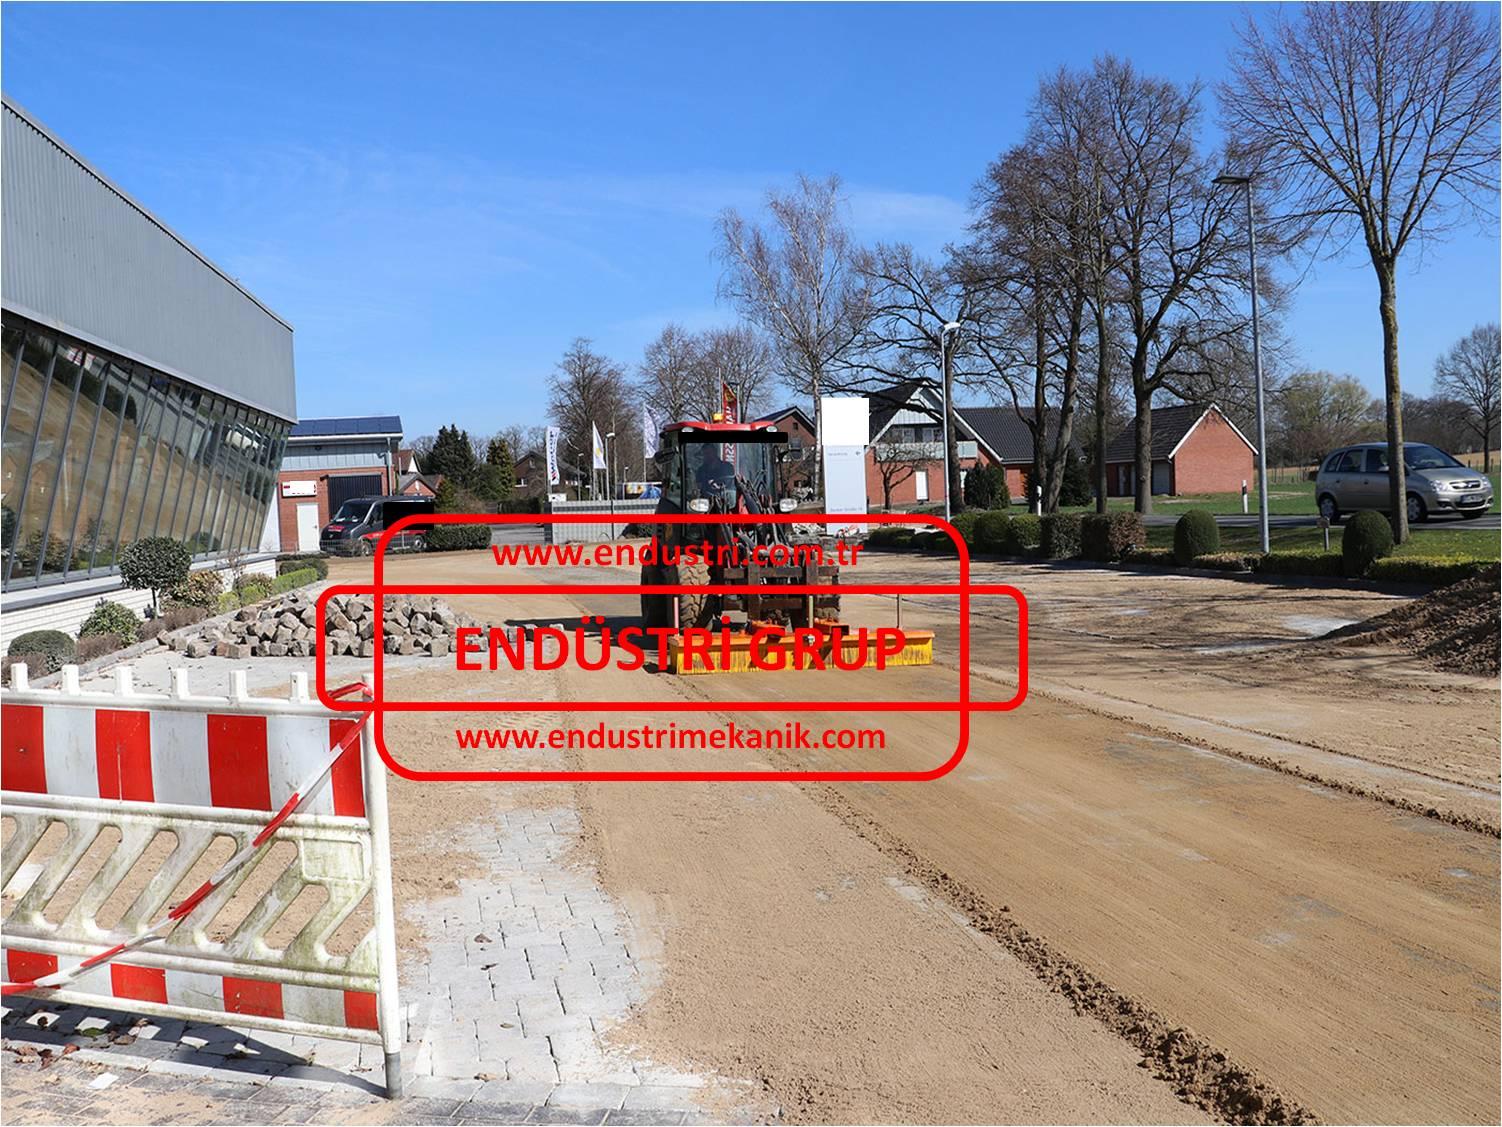 forklift-traktor-telehandler-transpalet-catali-supurge-atasmani-endustriyel-hidrolik-motorlu-doner-fabrika-yol-ahir-bahce-talas-hurda-cakil-tas-kaya-kum-cop-toz-supurme-fircasi